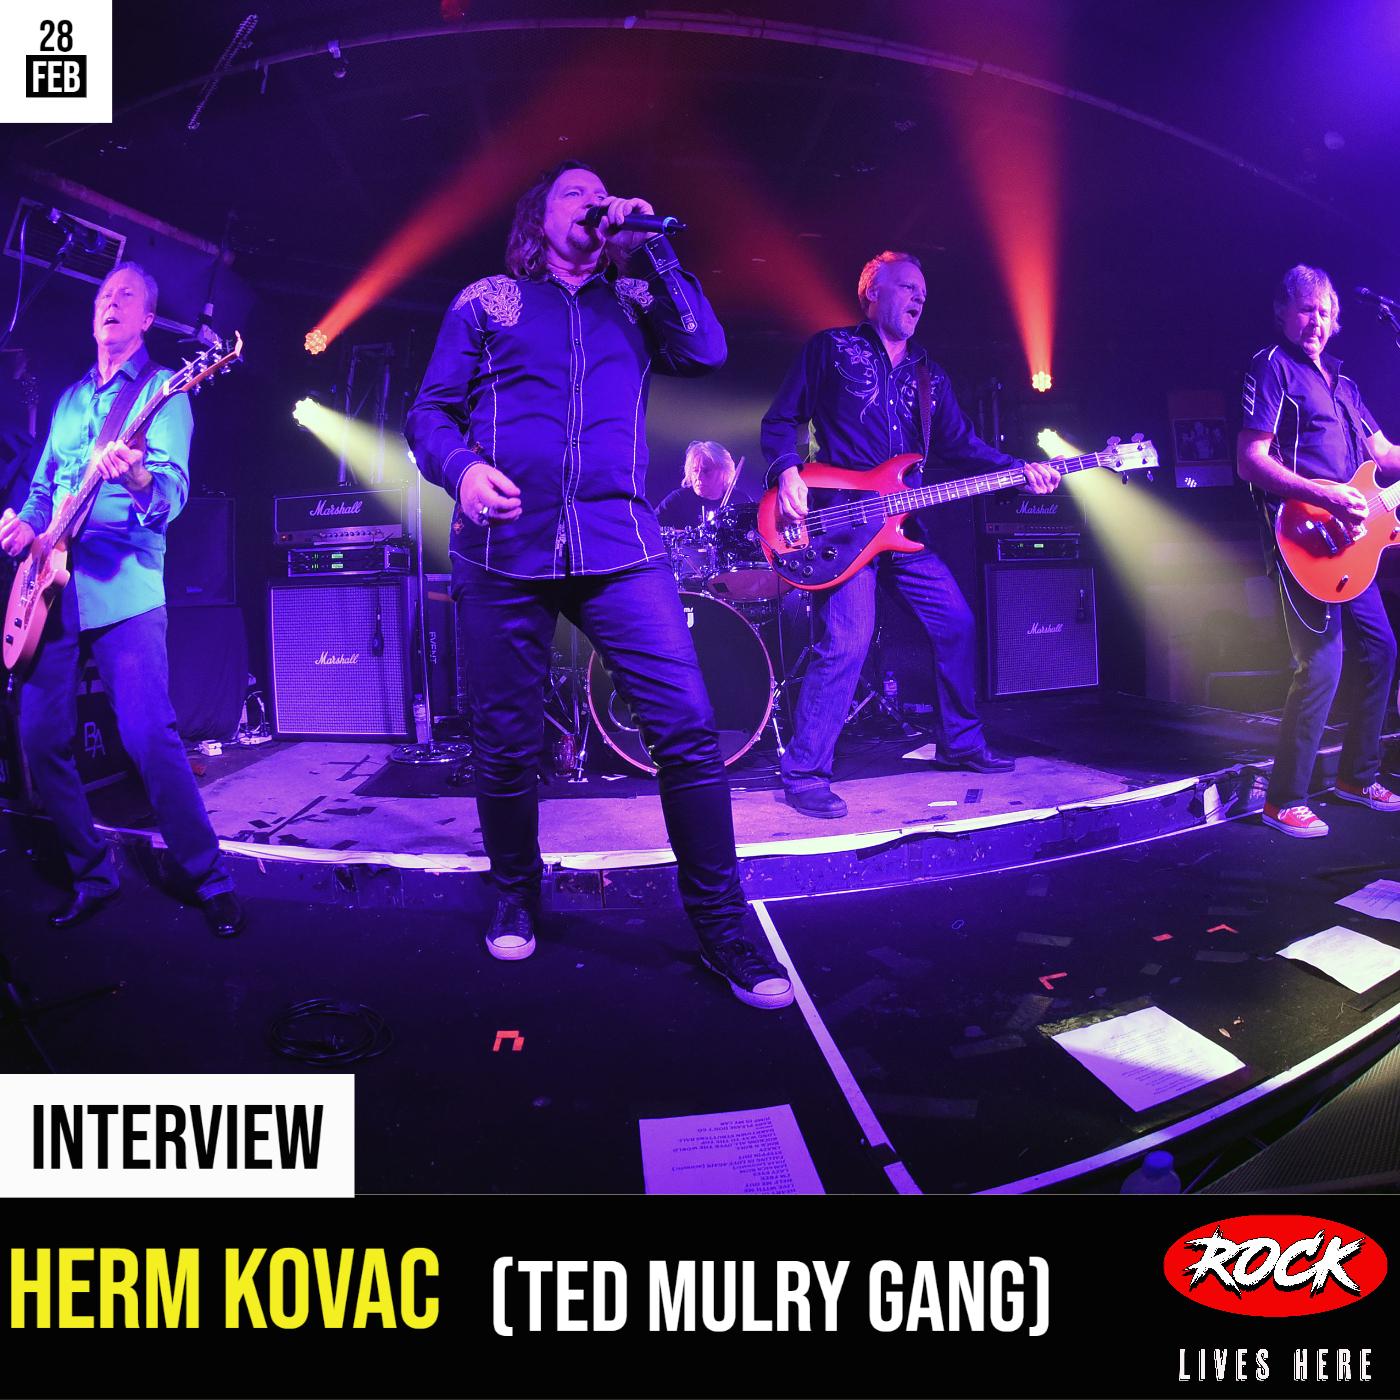 Herm Kovac (Ted Mulry Gang)